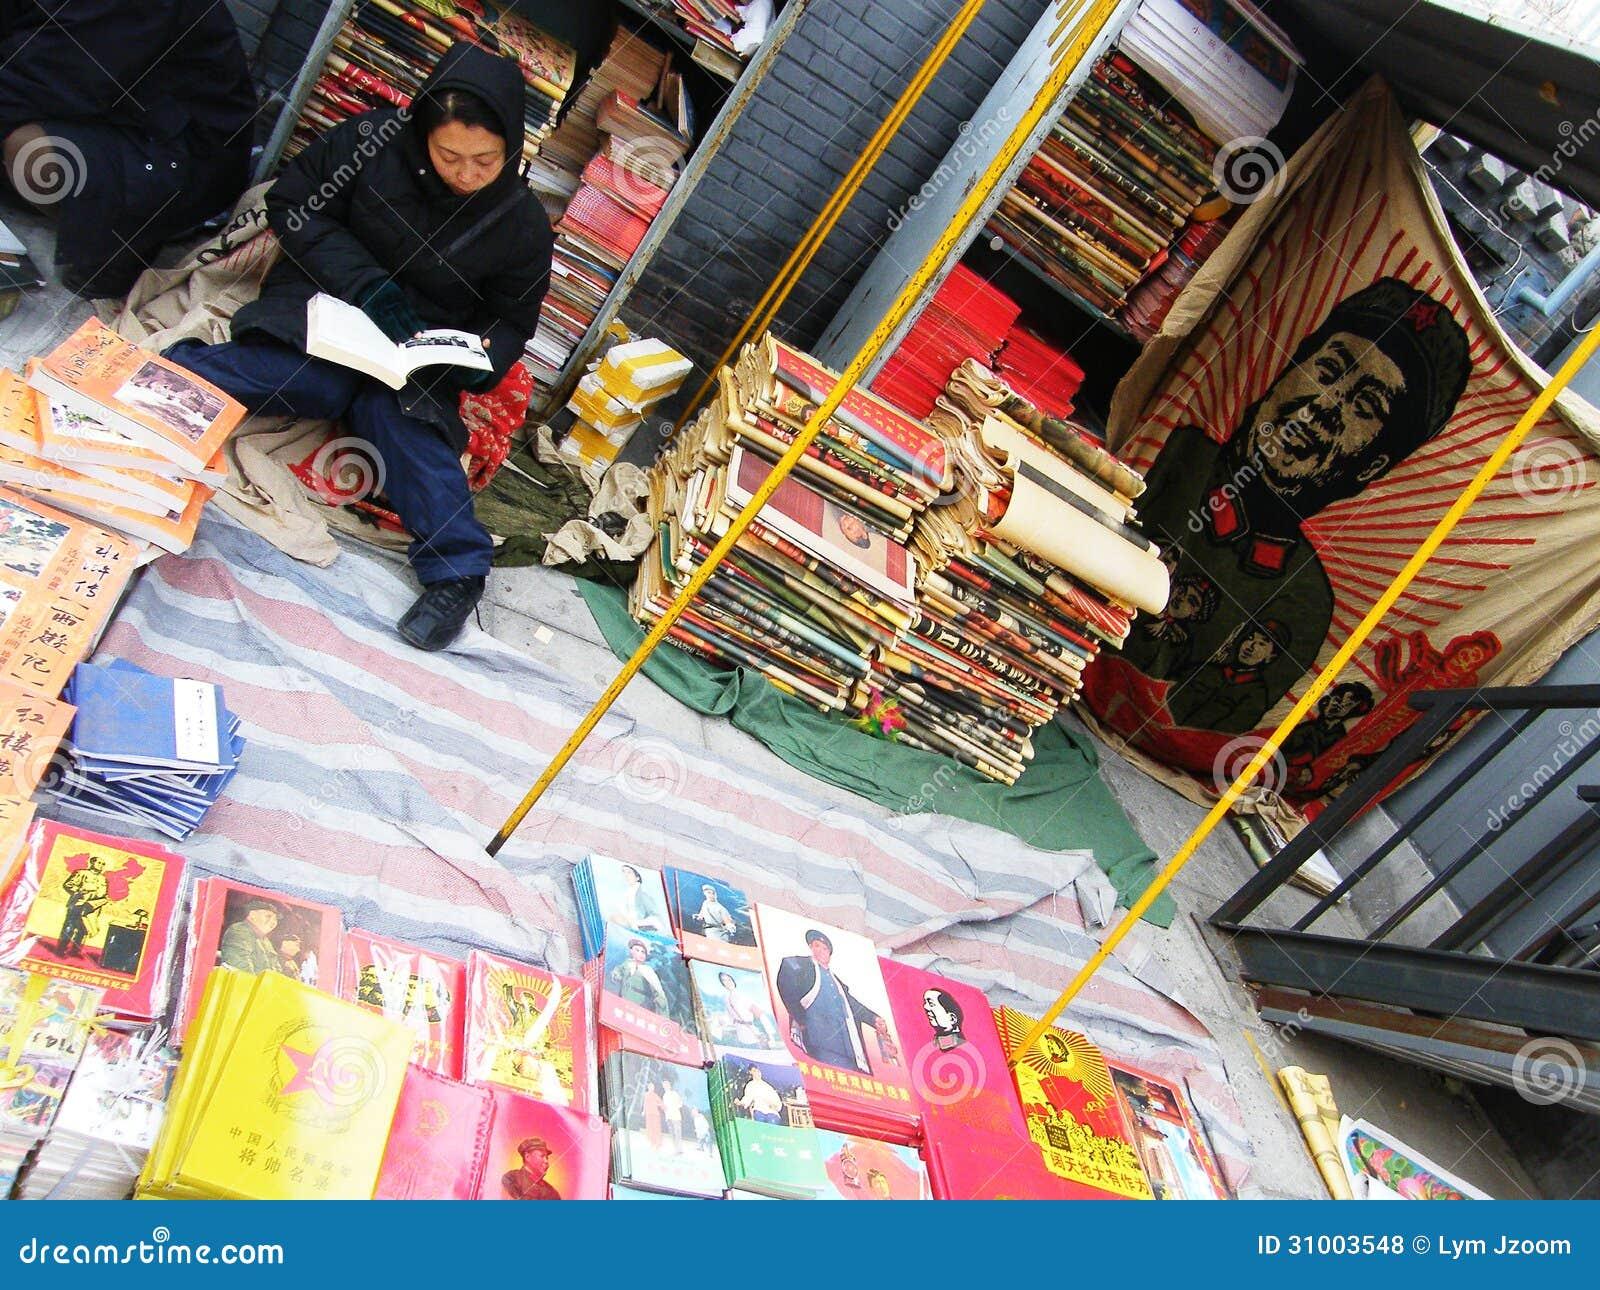 Reading beside Chairman Mao